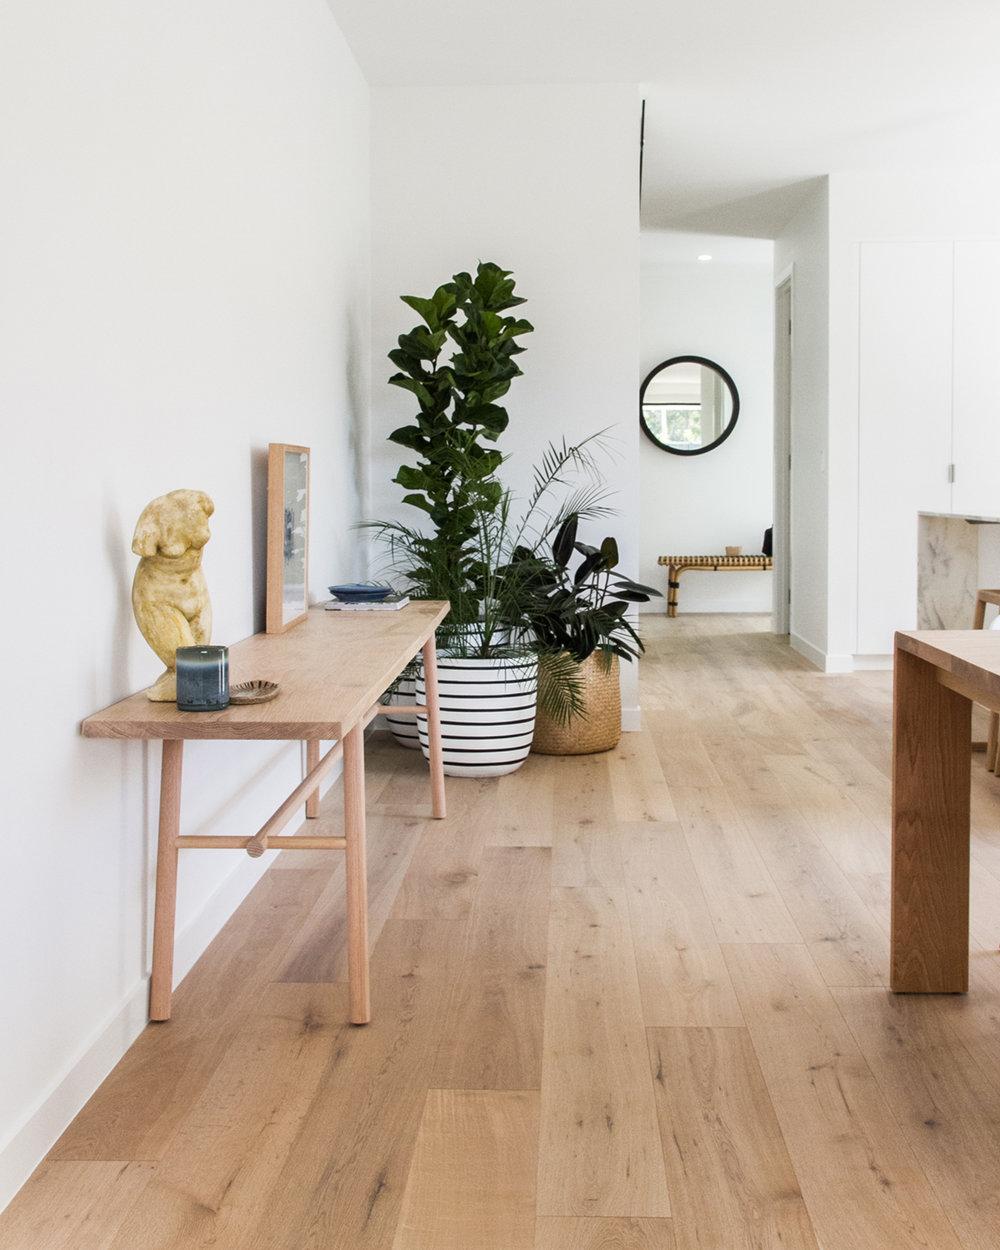 Kira and Kira - Gold Coast Property Styling - Home Interiors - Furniture DesignKira and Kira Gold Coast Property Styling Home Furniture IMG_6115 - small.jpg